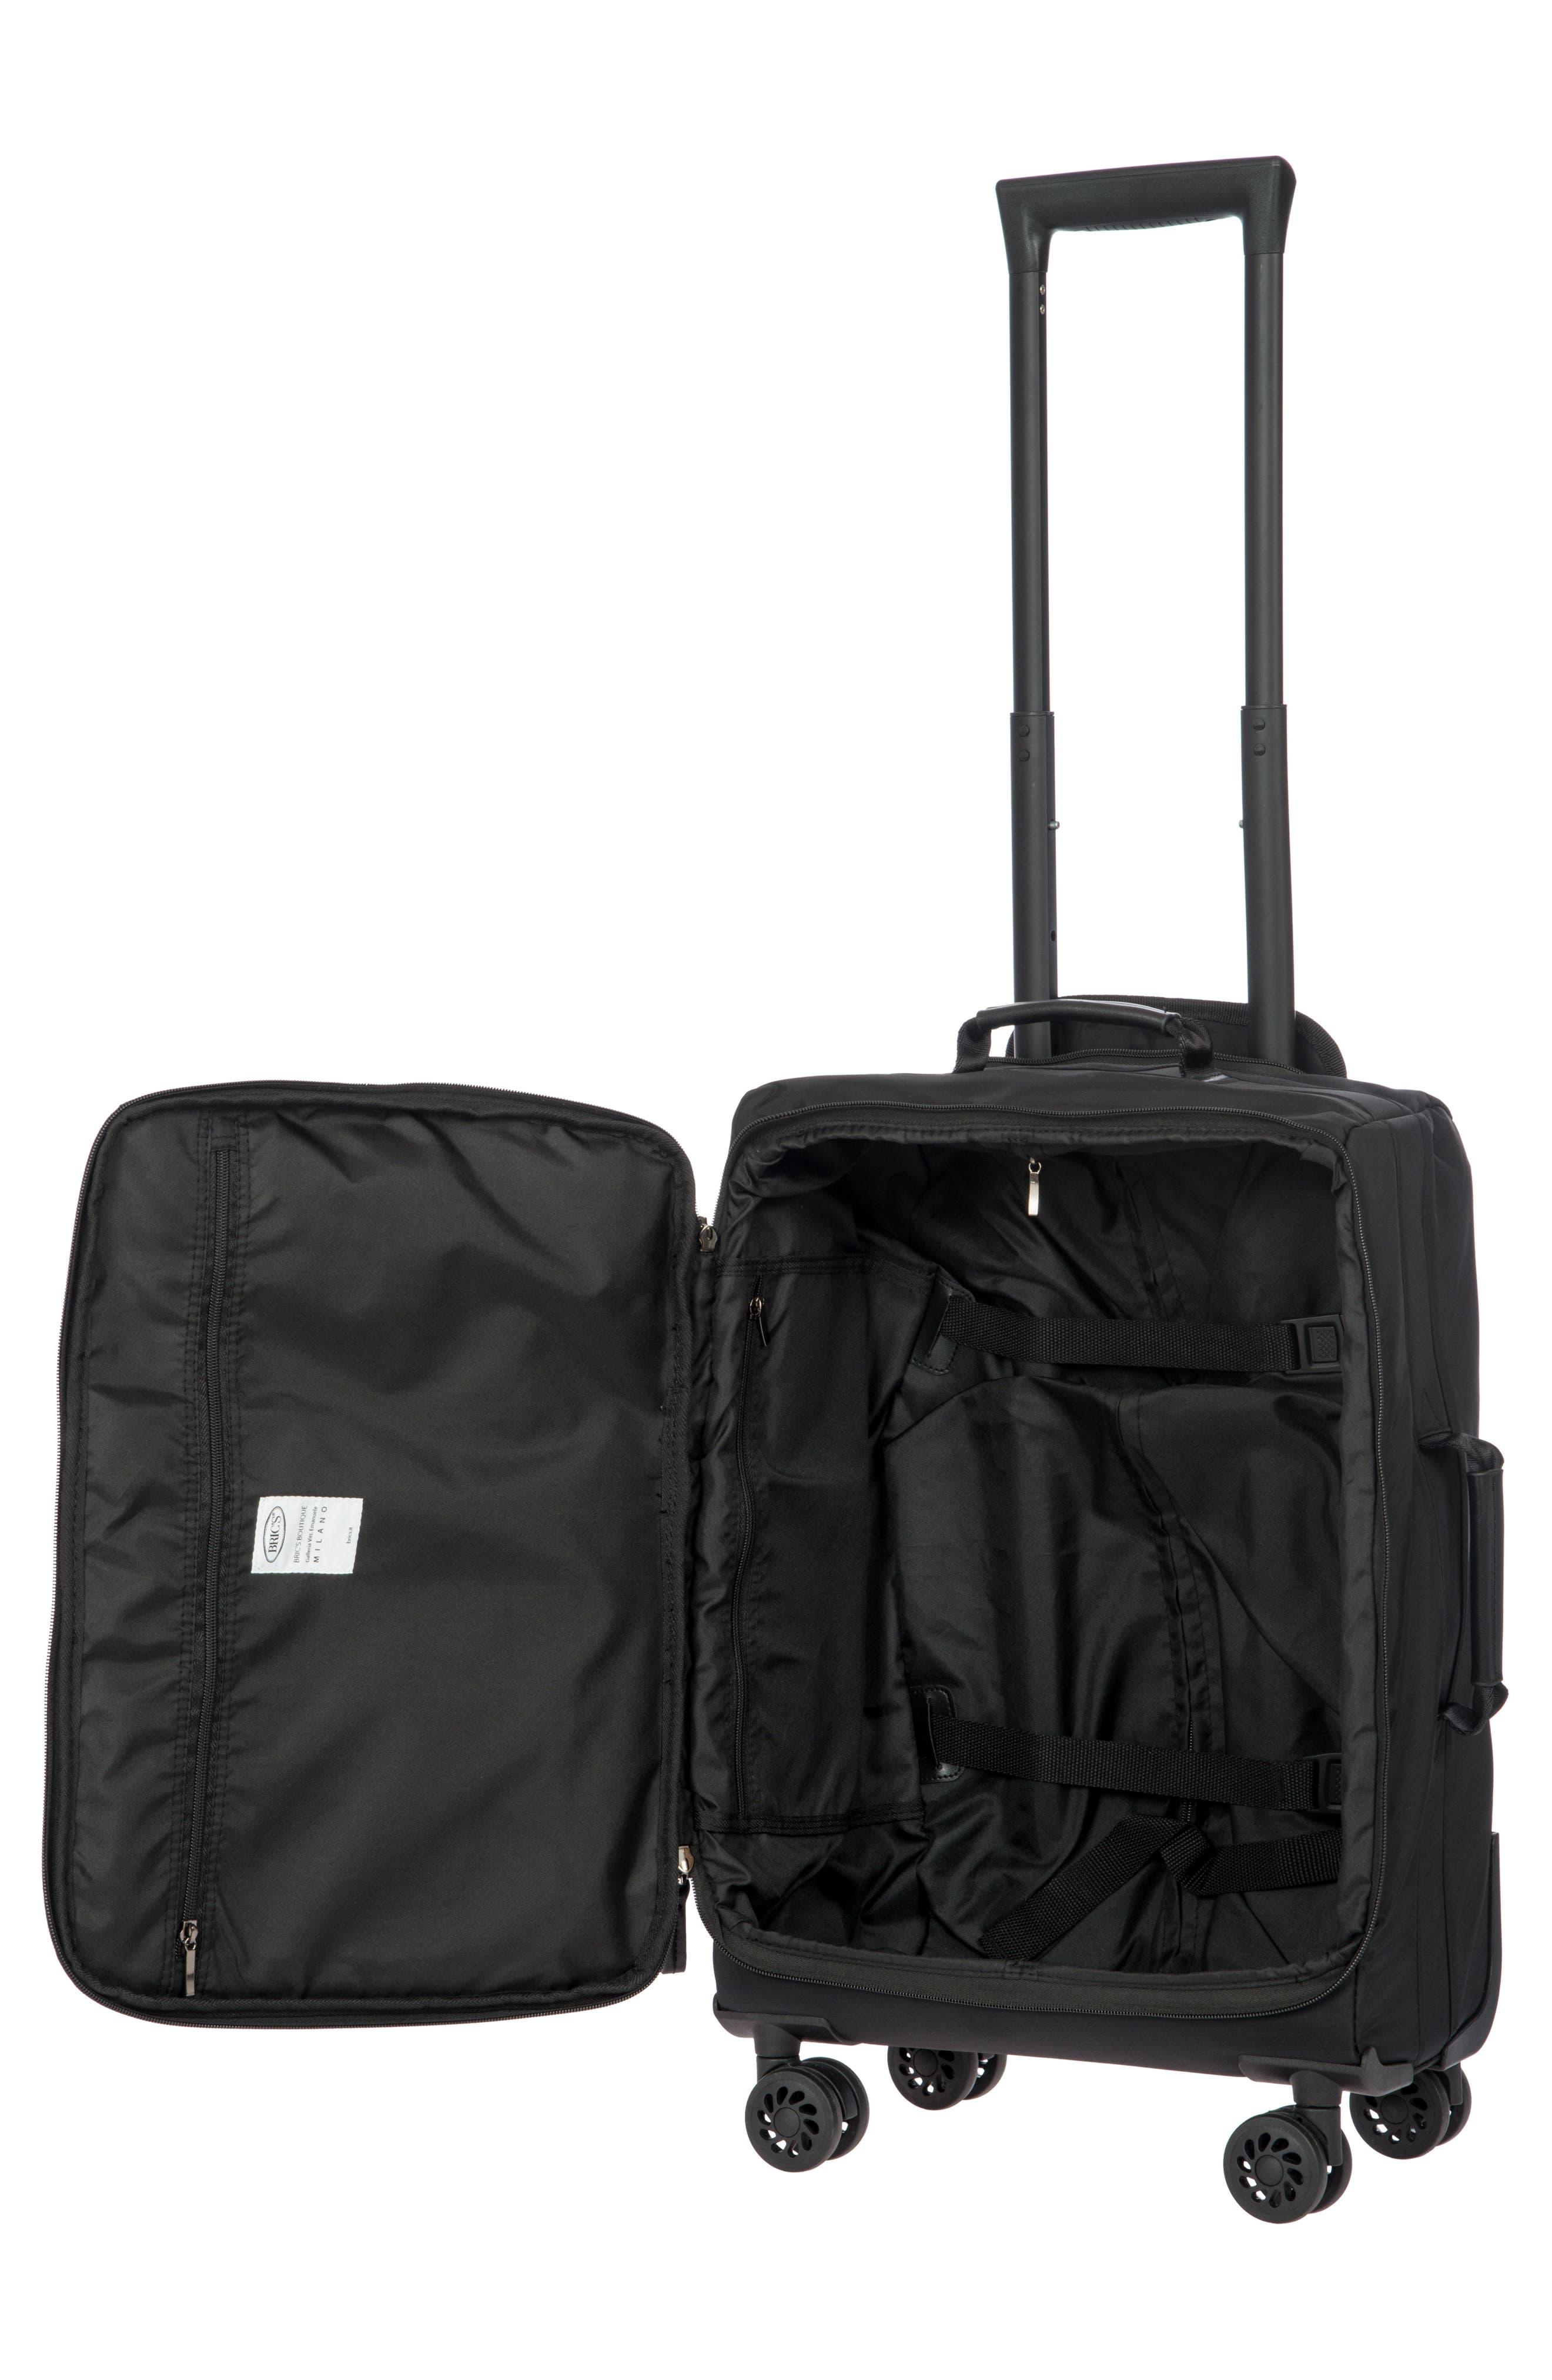 X-Bag 21-Inch Spinner Carry-On,                             Alternate thumbnail 2, color,                             Black/ Black